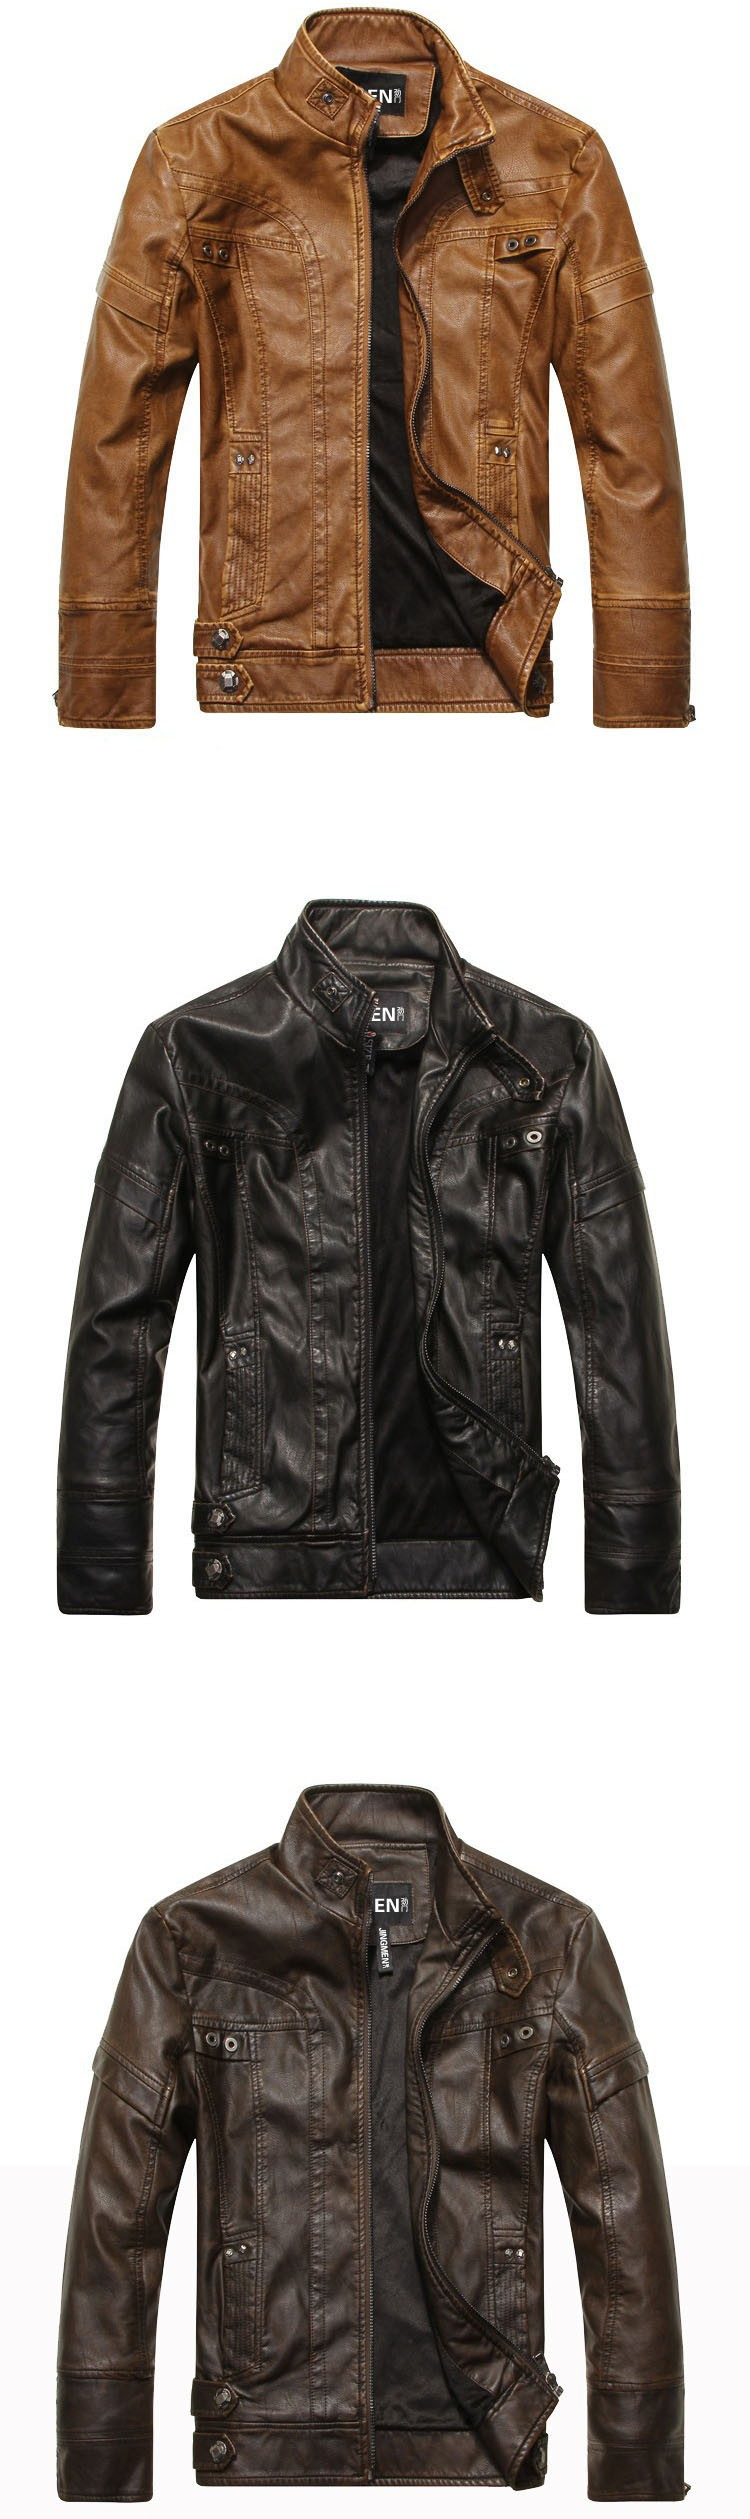 PU Leather Jacket Men 2016 Fall Winter Fashion Faux Fur Bomber Motercycle Biker Jacket High Quality Plus Velvet Casual Outwear (6)